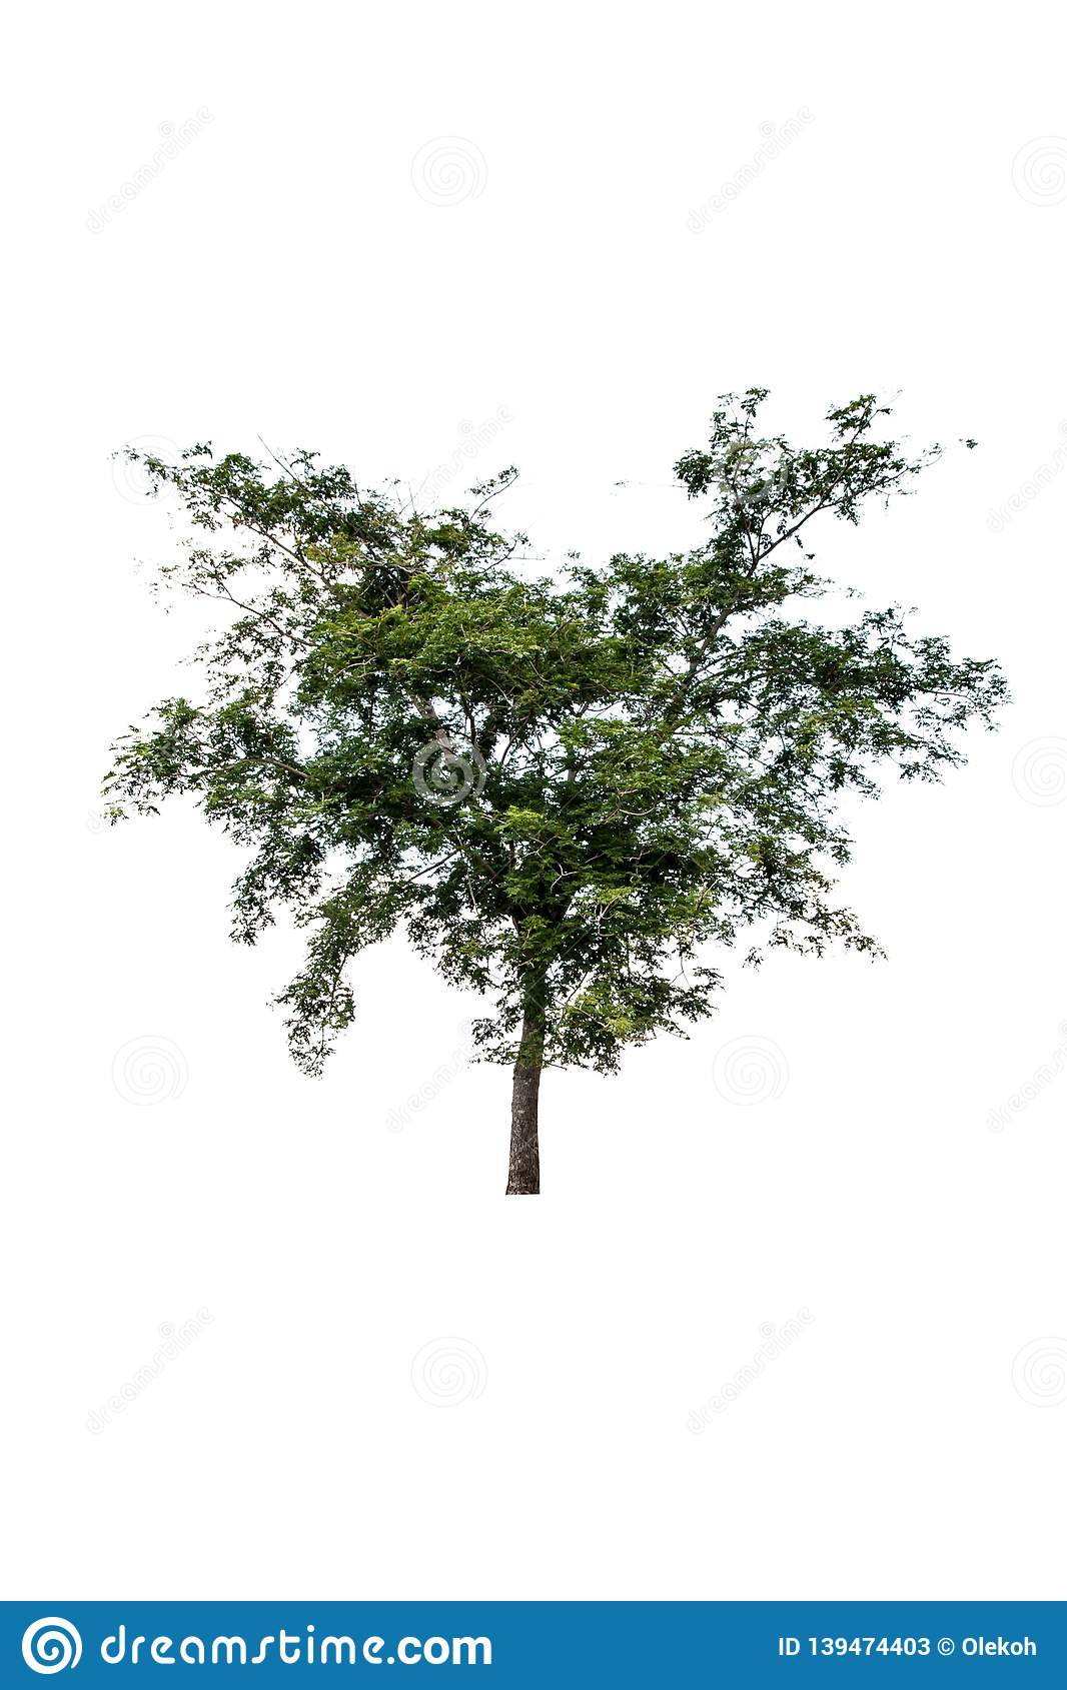 Plam tree on isolated background